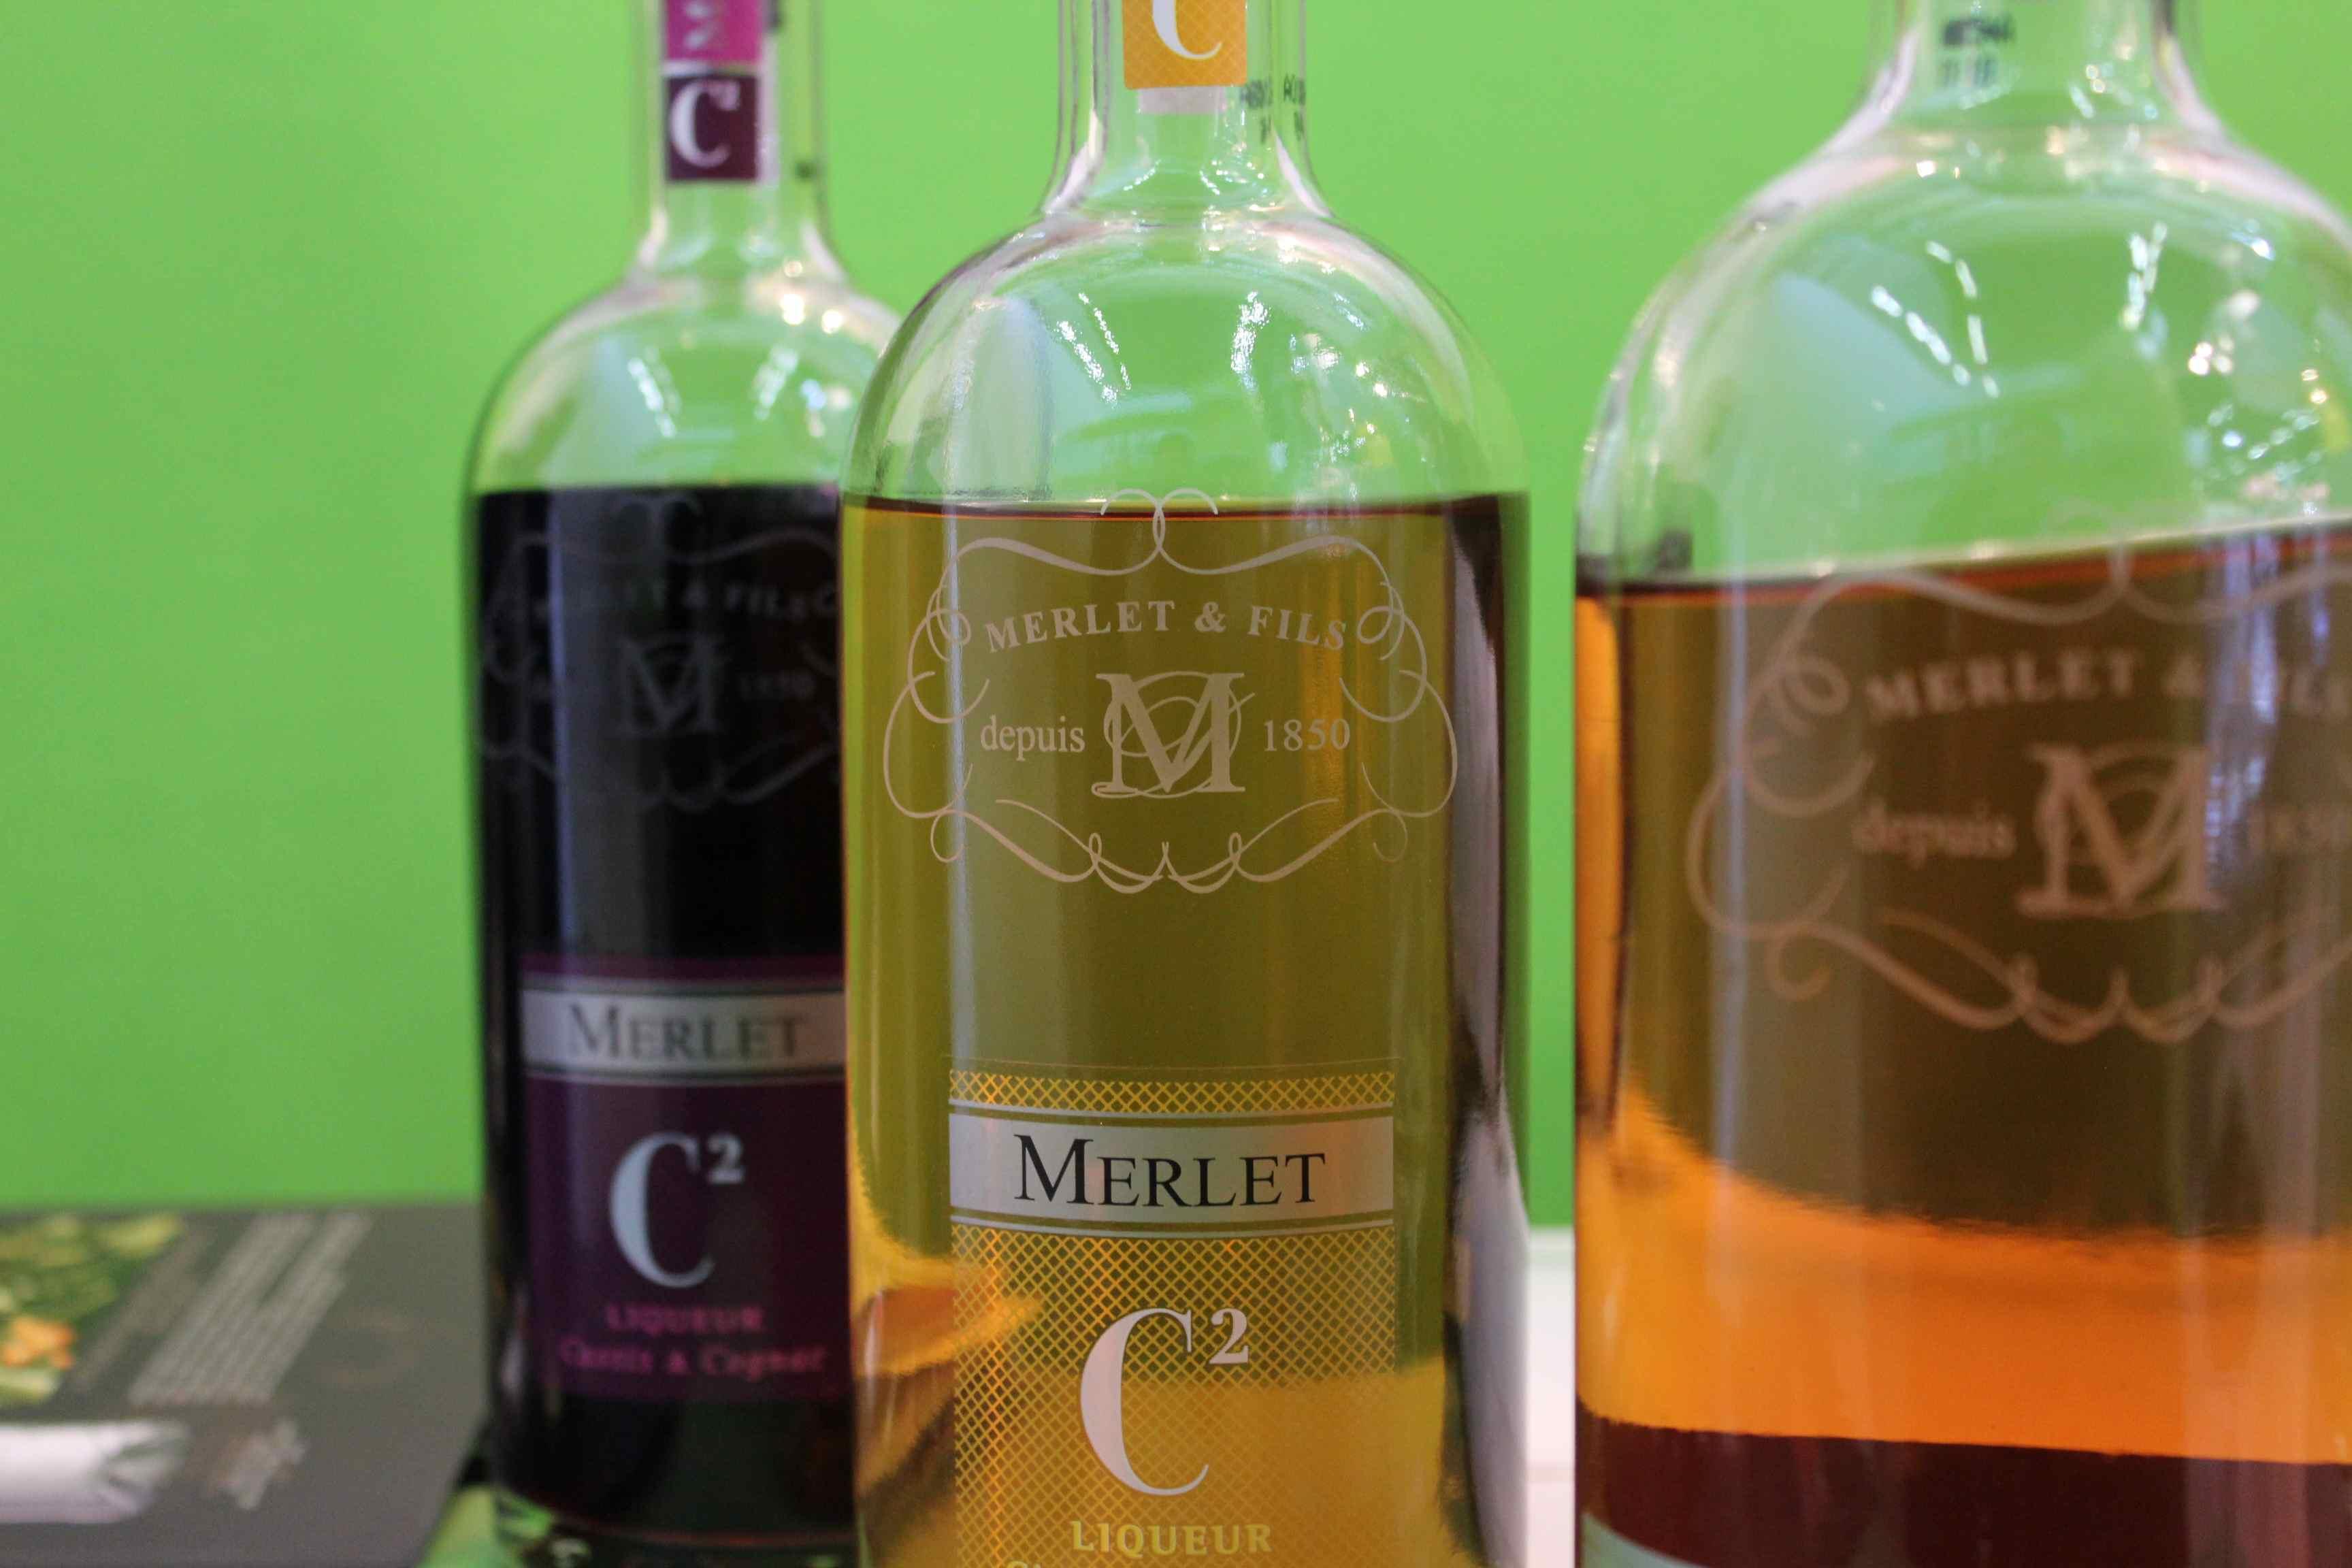 Merlet Liqueur C2